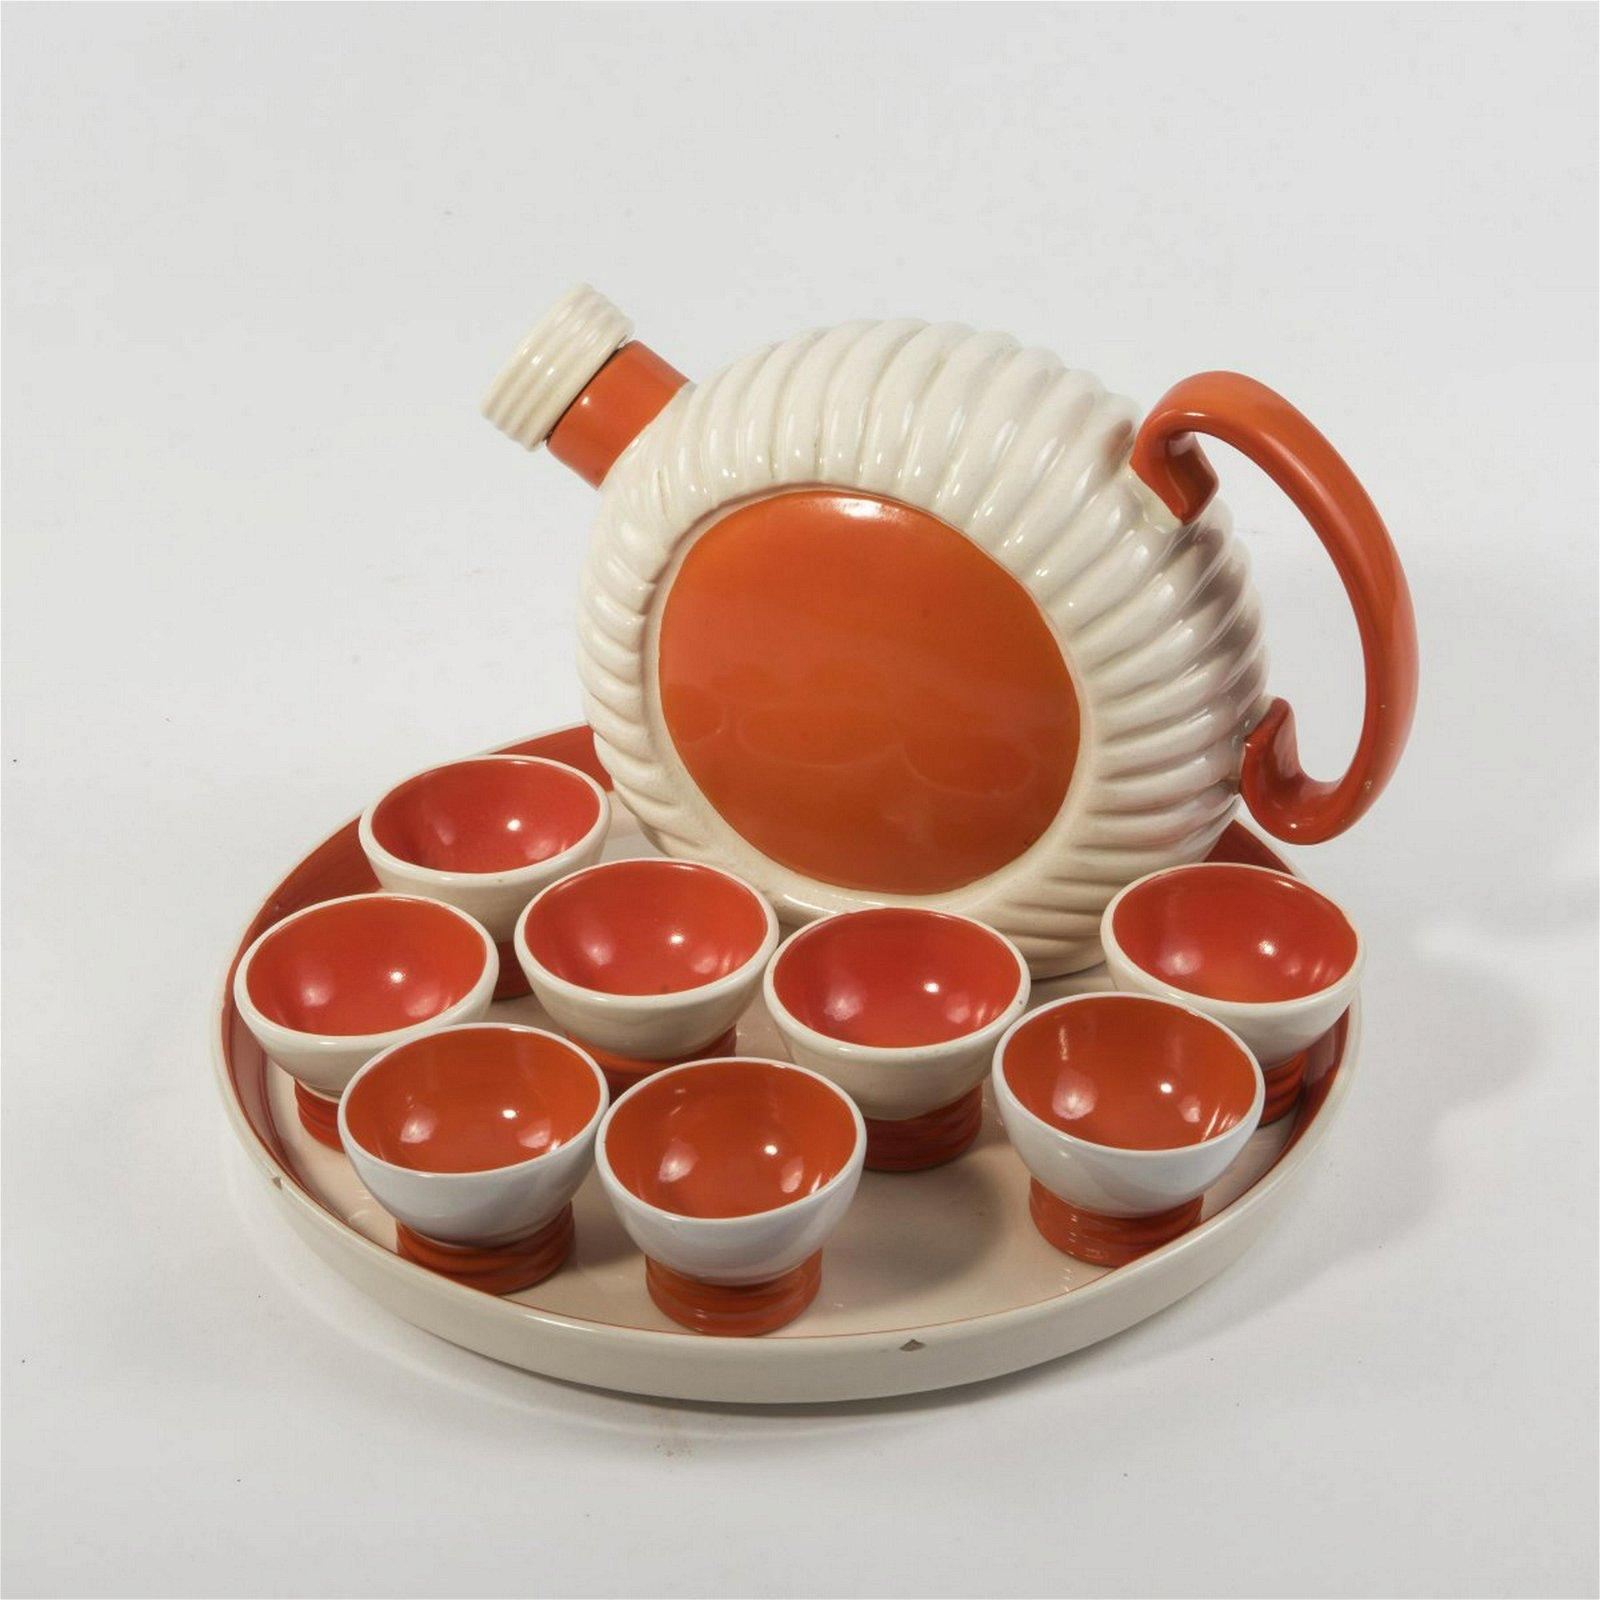 Ceramiche Pucci, Umbertide, Liquor set, 1940s